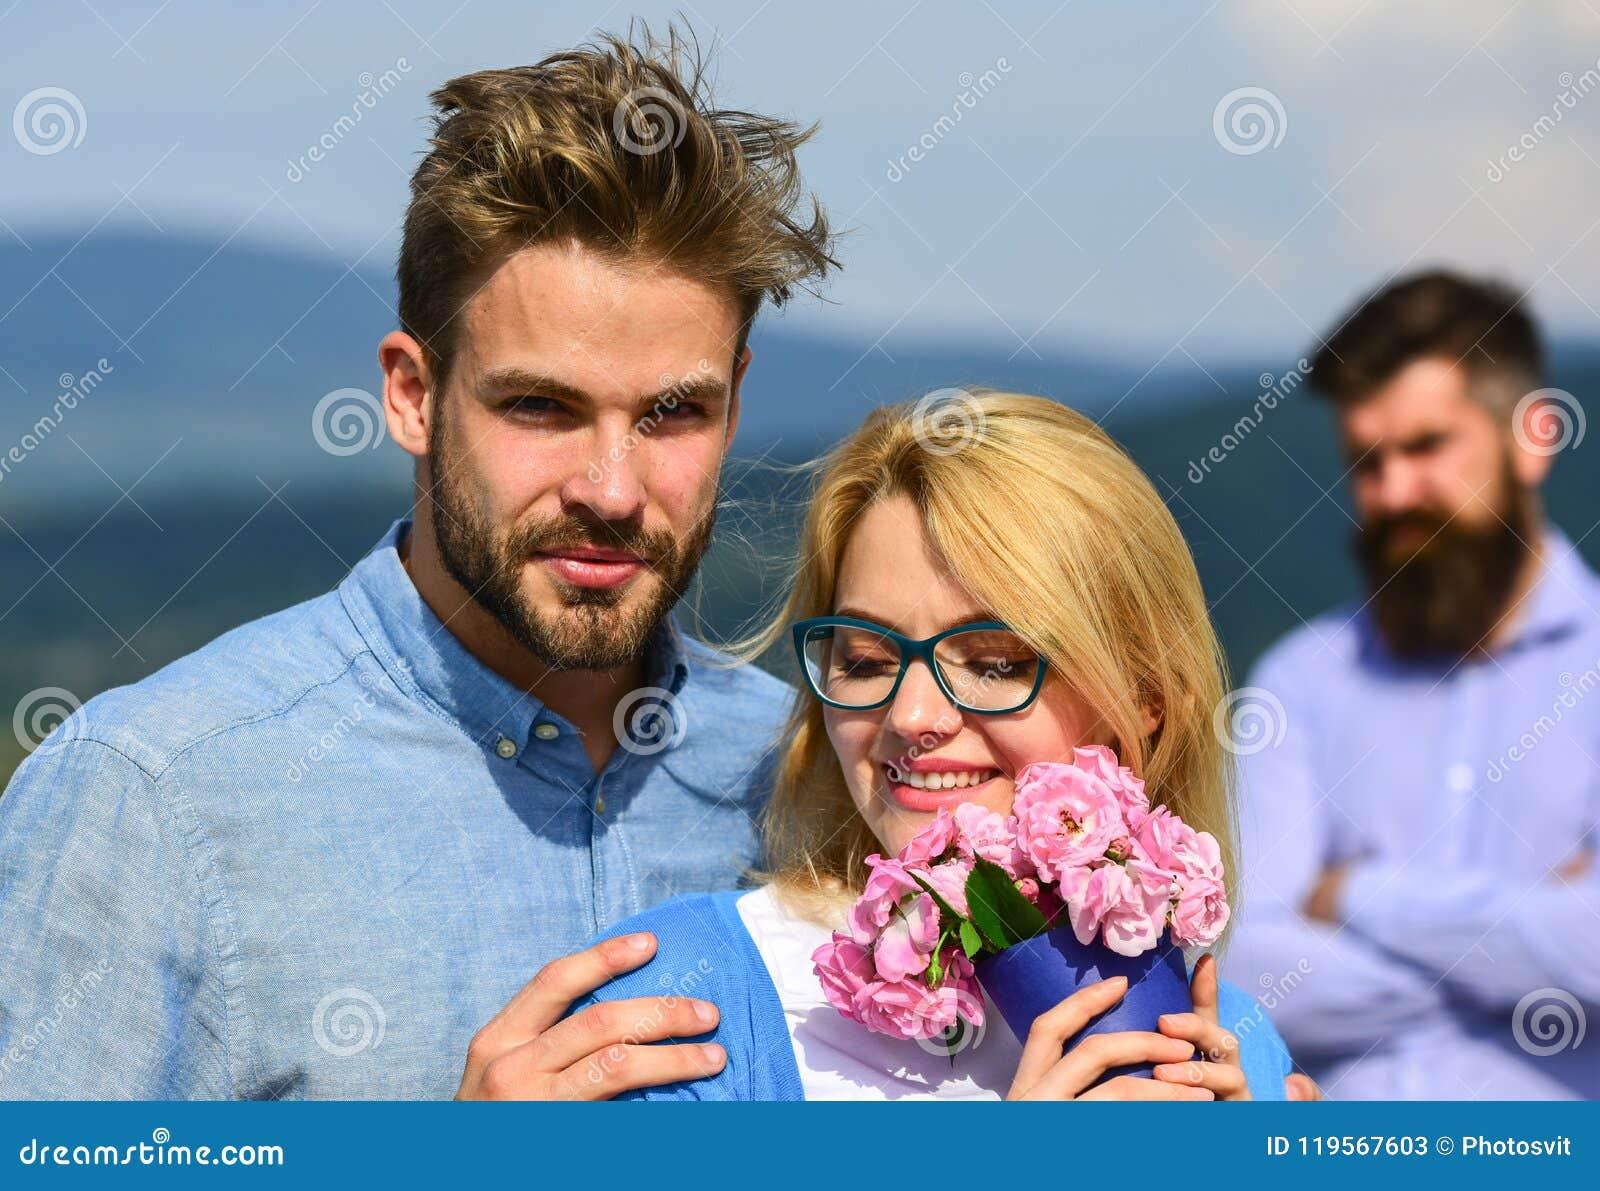 craigslist secure dating verification